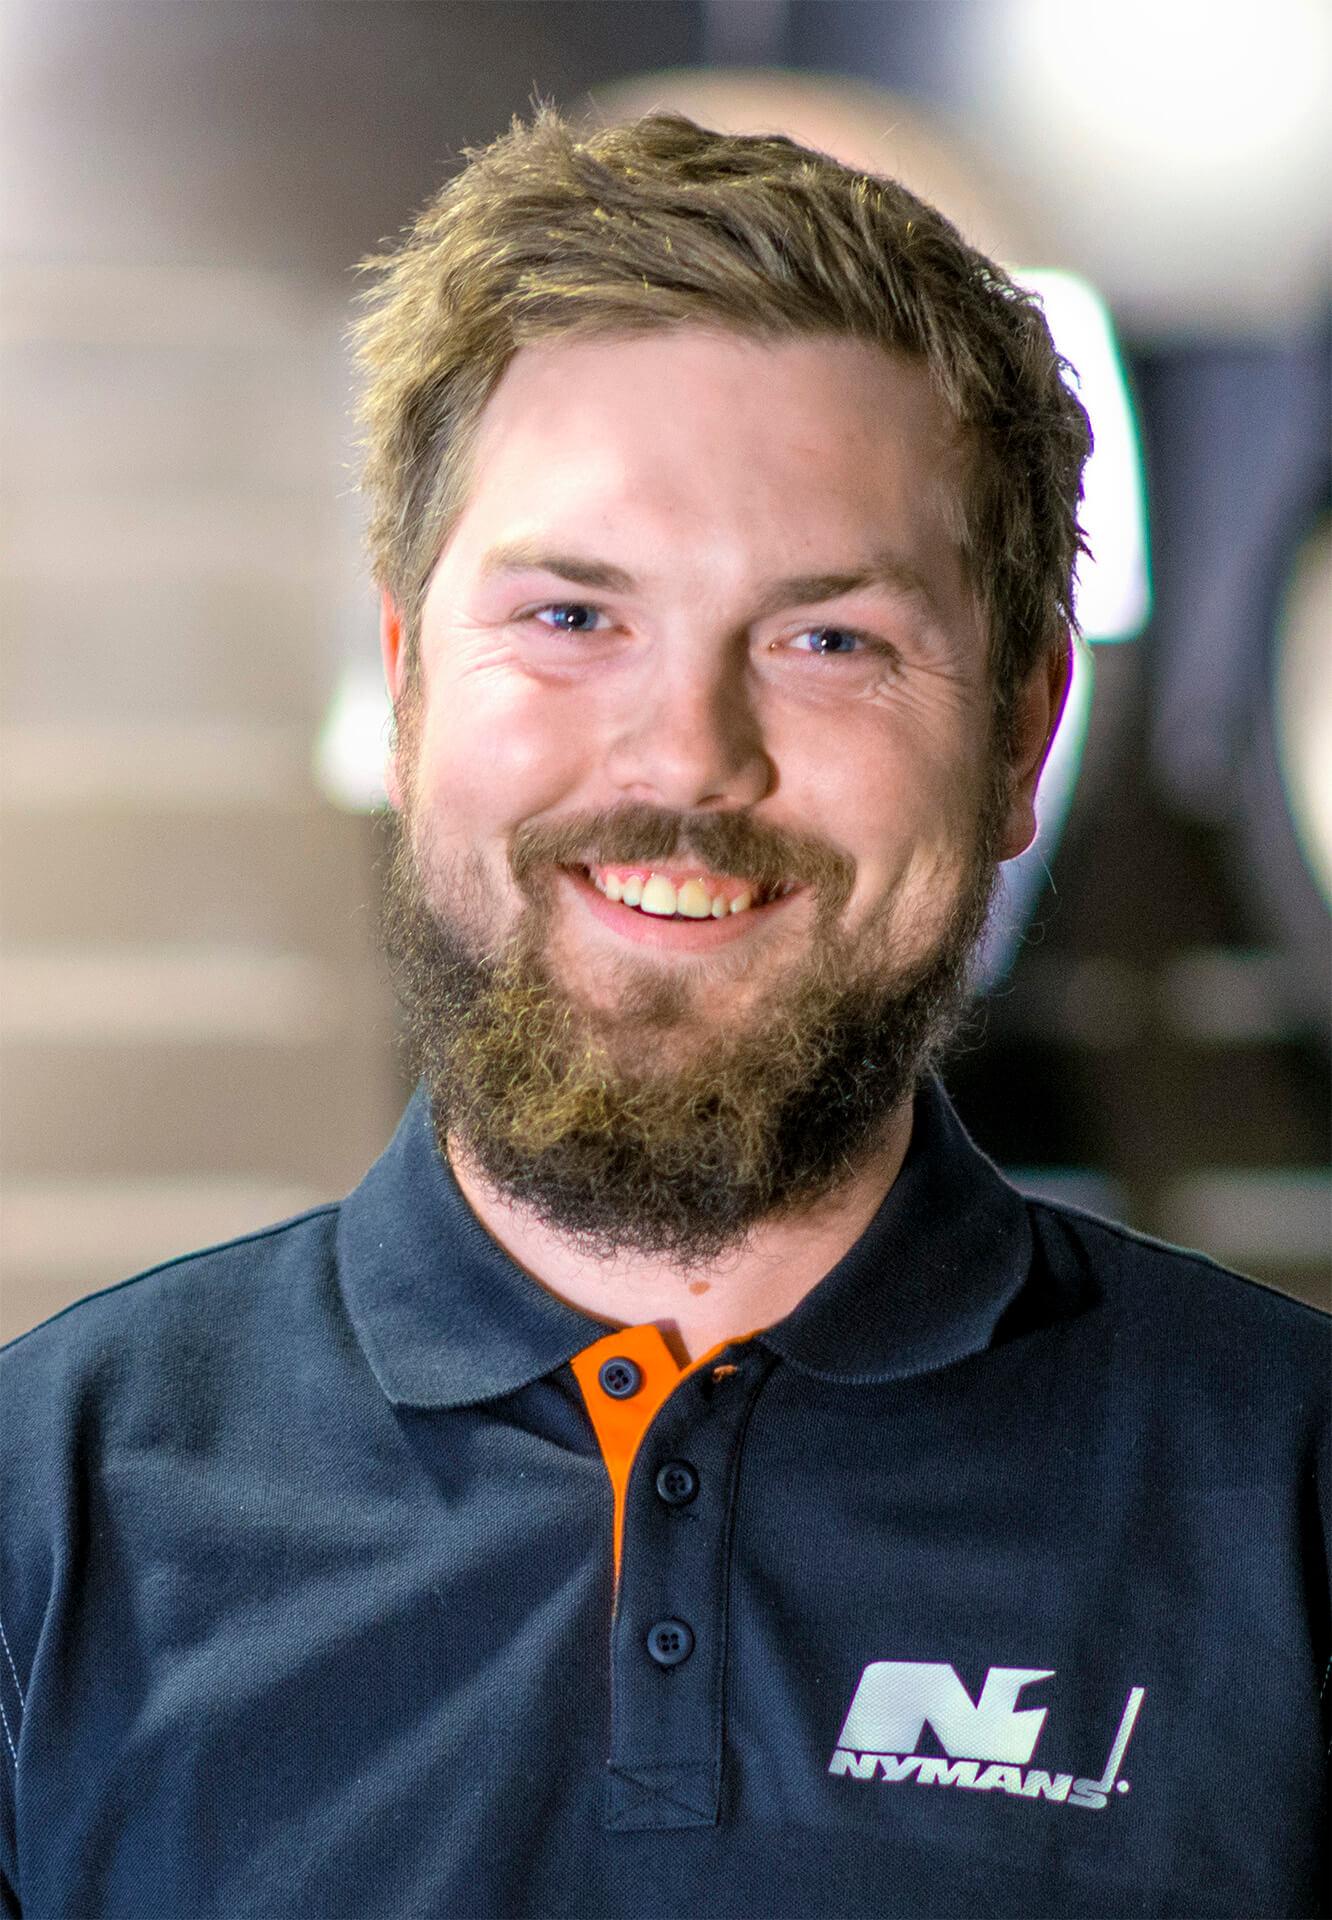 Anton Nilsson - Nymans Däck